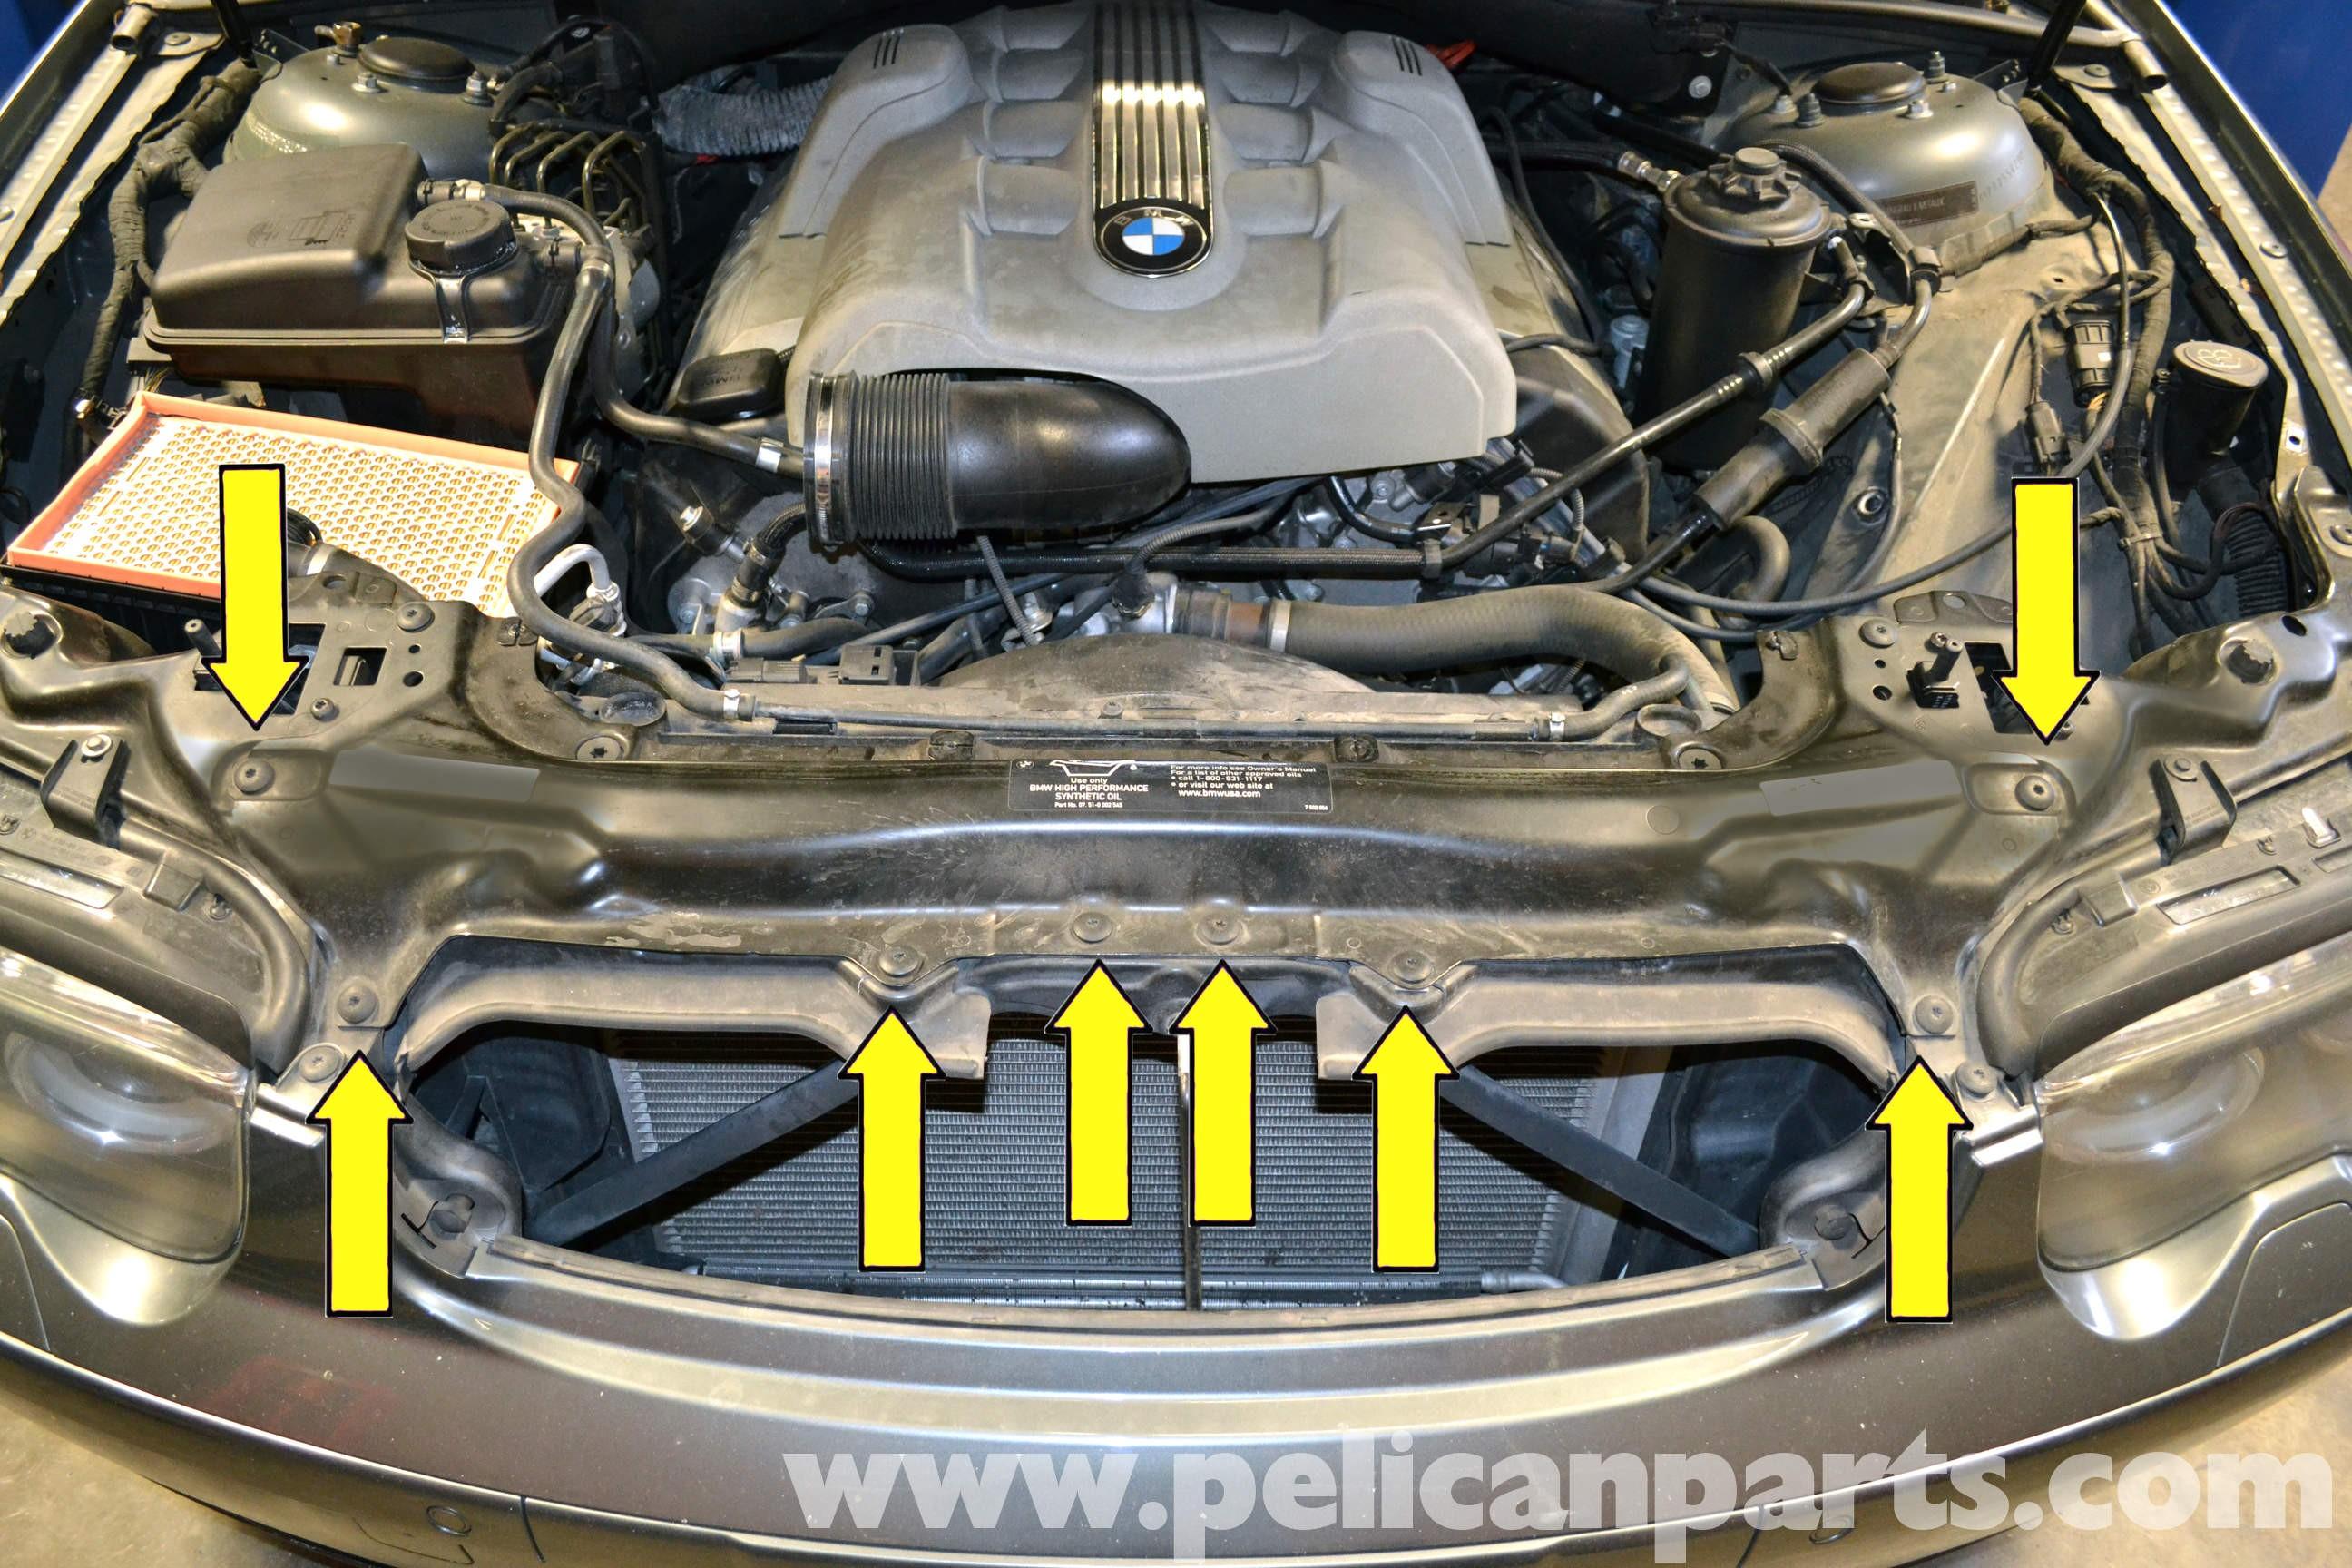 Bmw 745i Engine Diagram Bmw the Infamous Alternator Bracket Oil Leak On the E65 Bmw 7 Of Bmw 745i Engine Diagram Engine Wiring Bmw Engine Wiring Harness Diagram E Diagrams